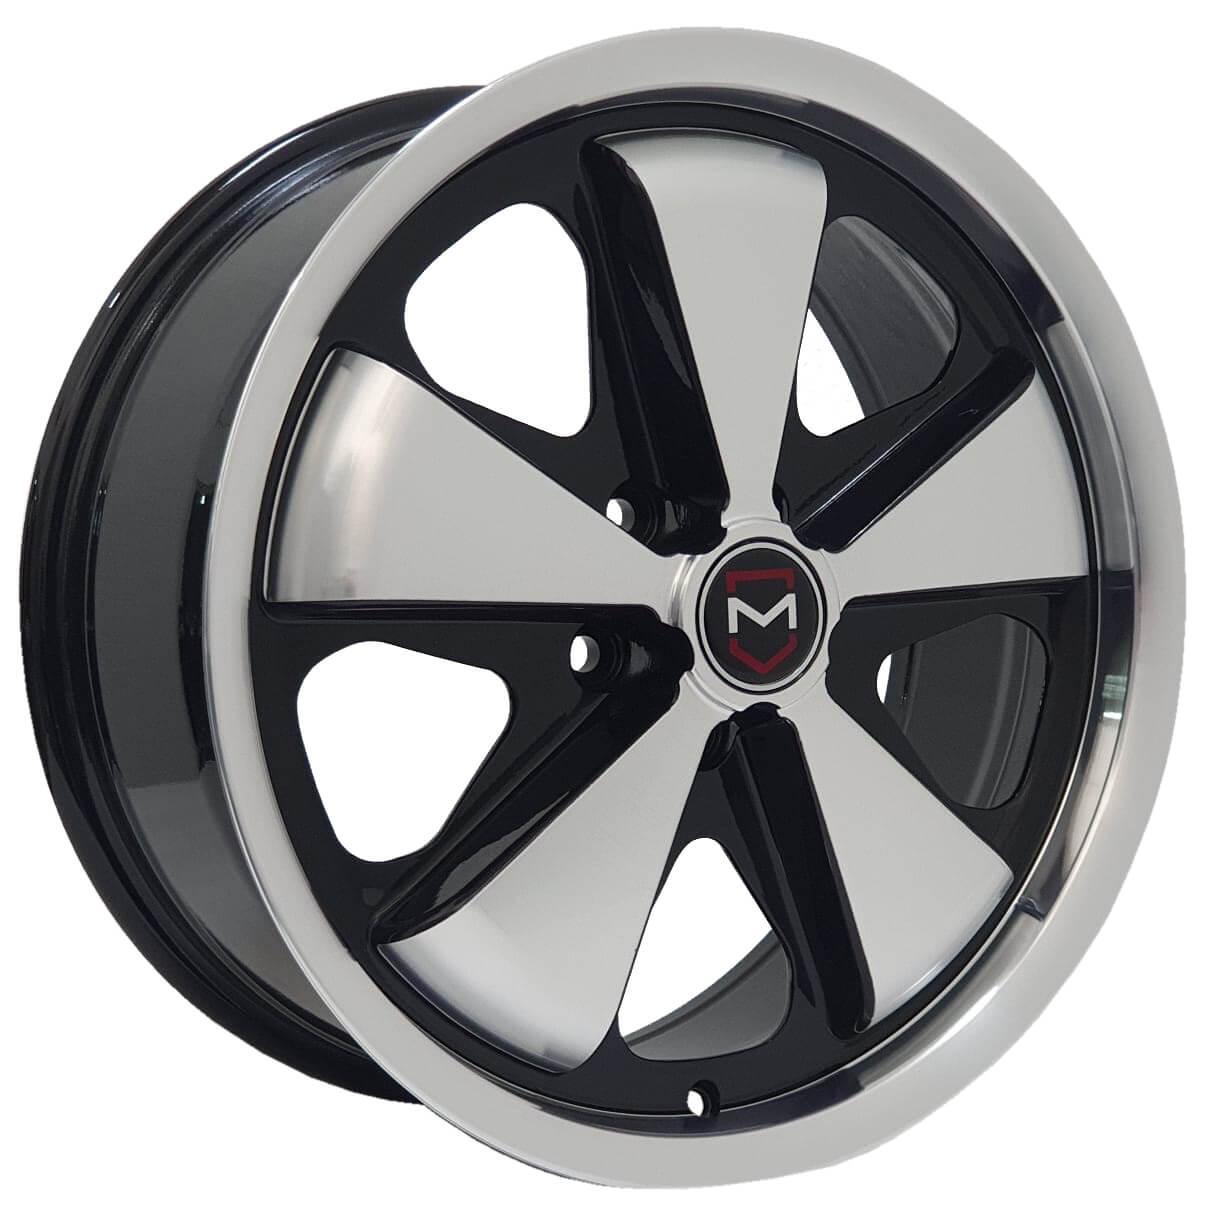 Jogo Rodas Monacco Wheels VLK-130 (FUCHS) Aro 17 5x114 Preto Diamantado Brilhante